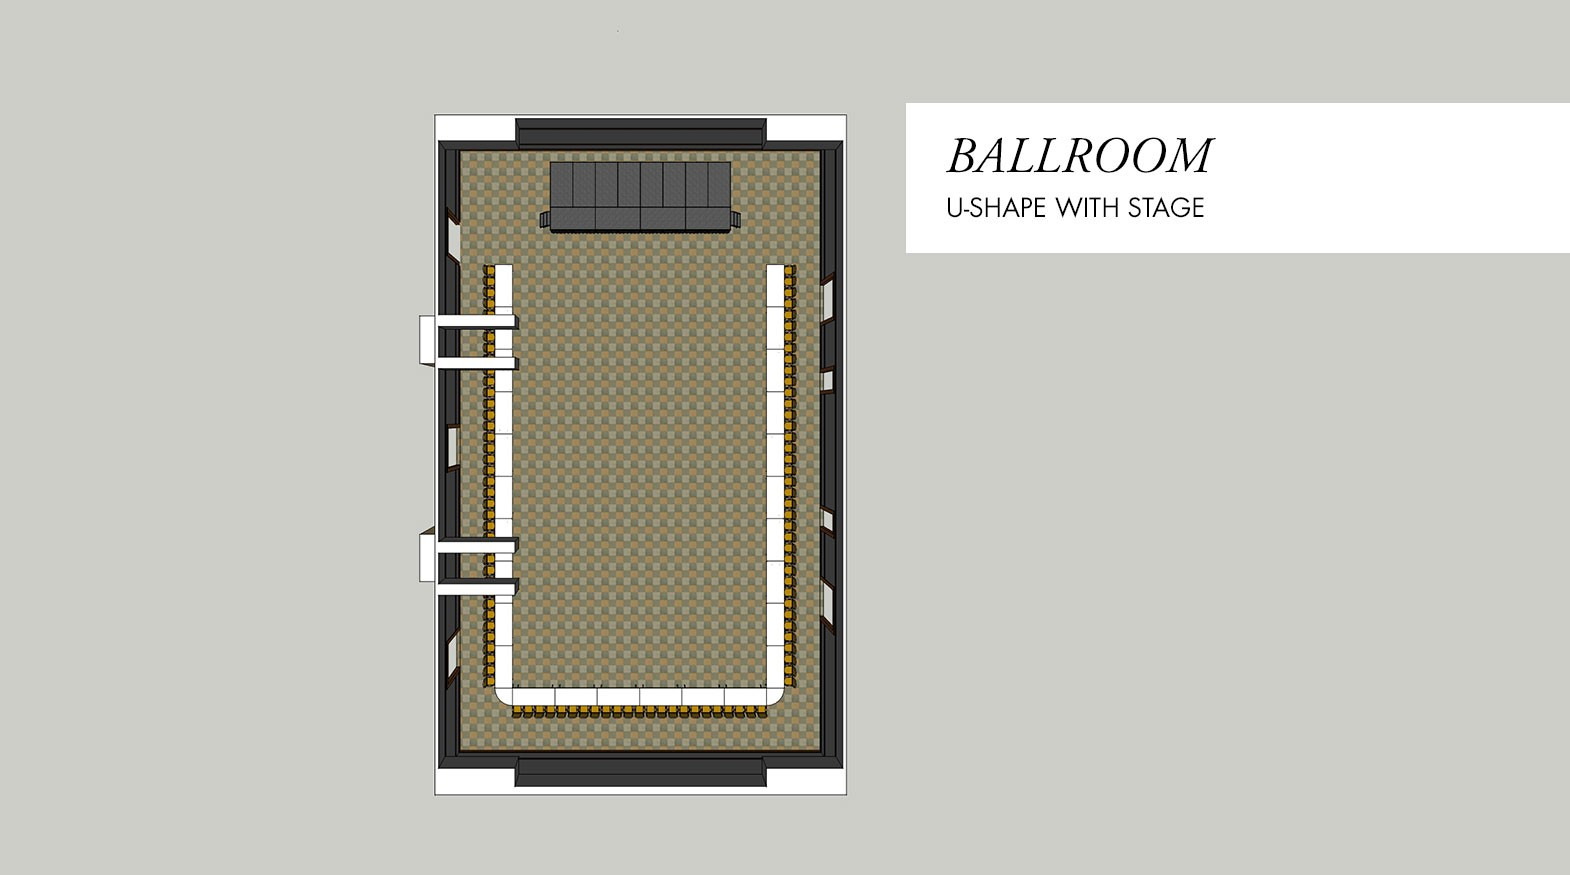 ballroom-u-shape.jpg